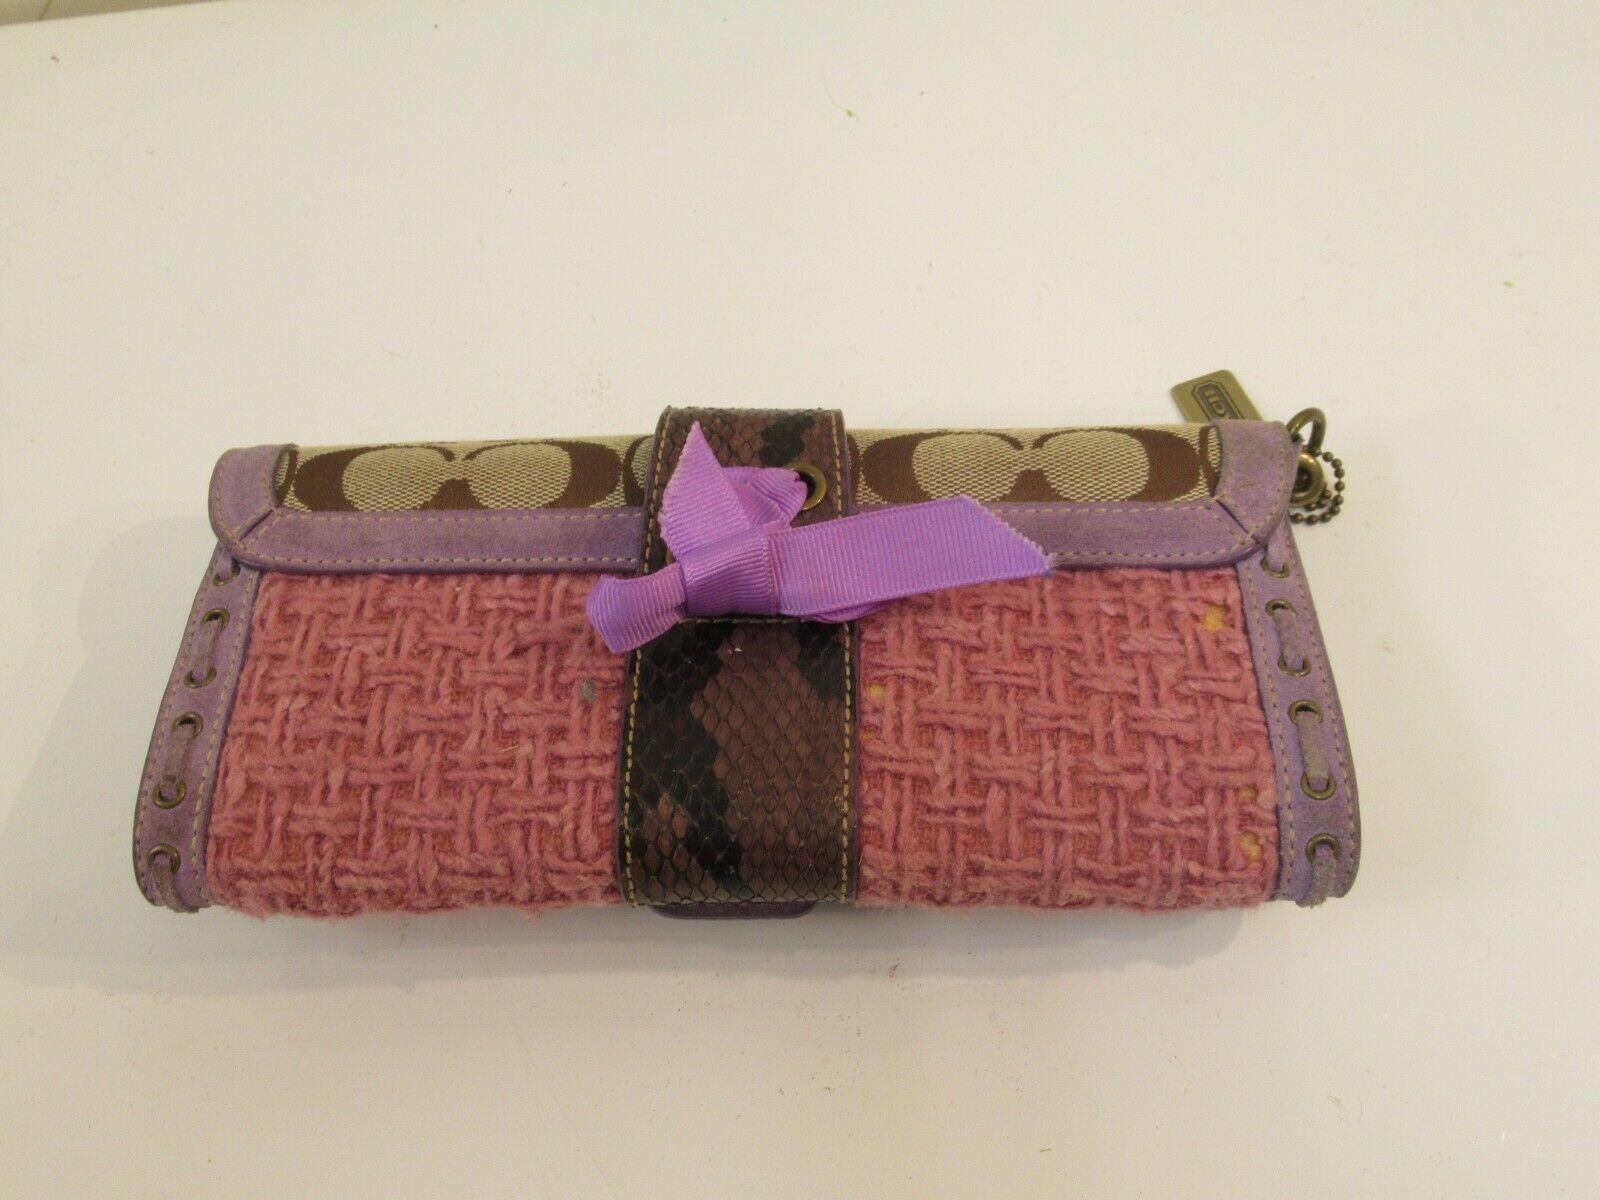 Coach Wristlet Tweed Purple Suede Wallet Buckle Handbag Clutch Monogram C image 5